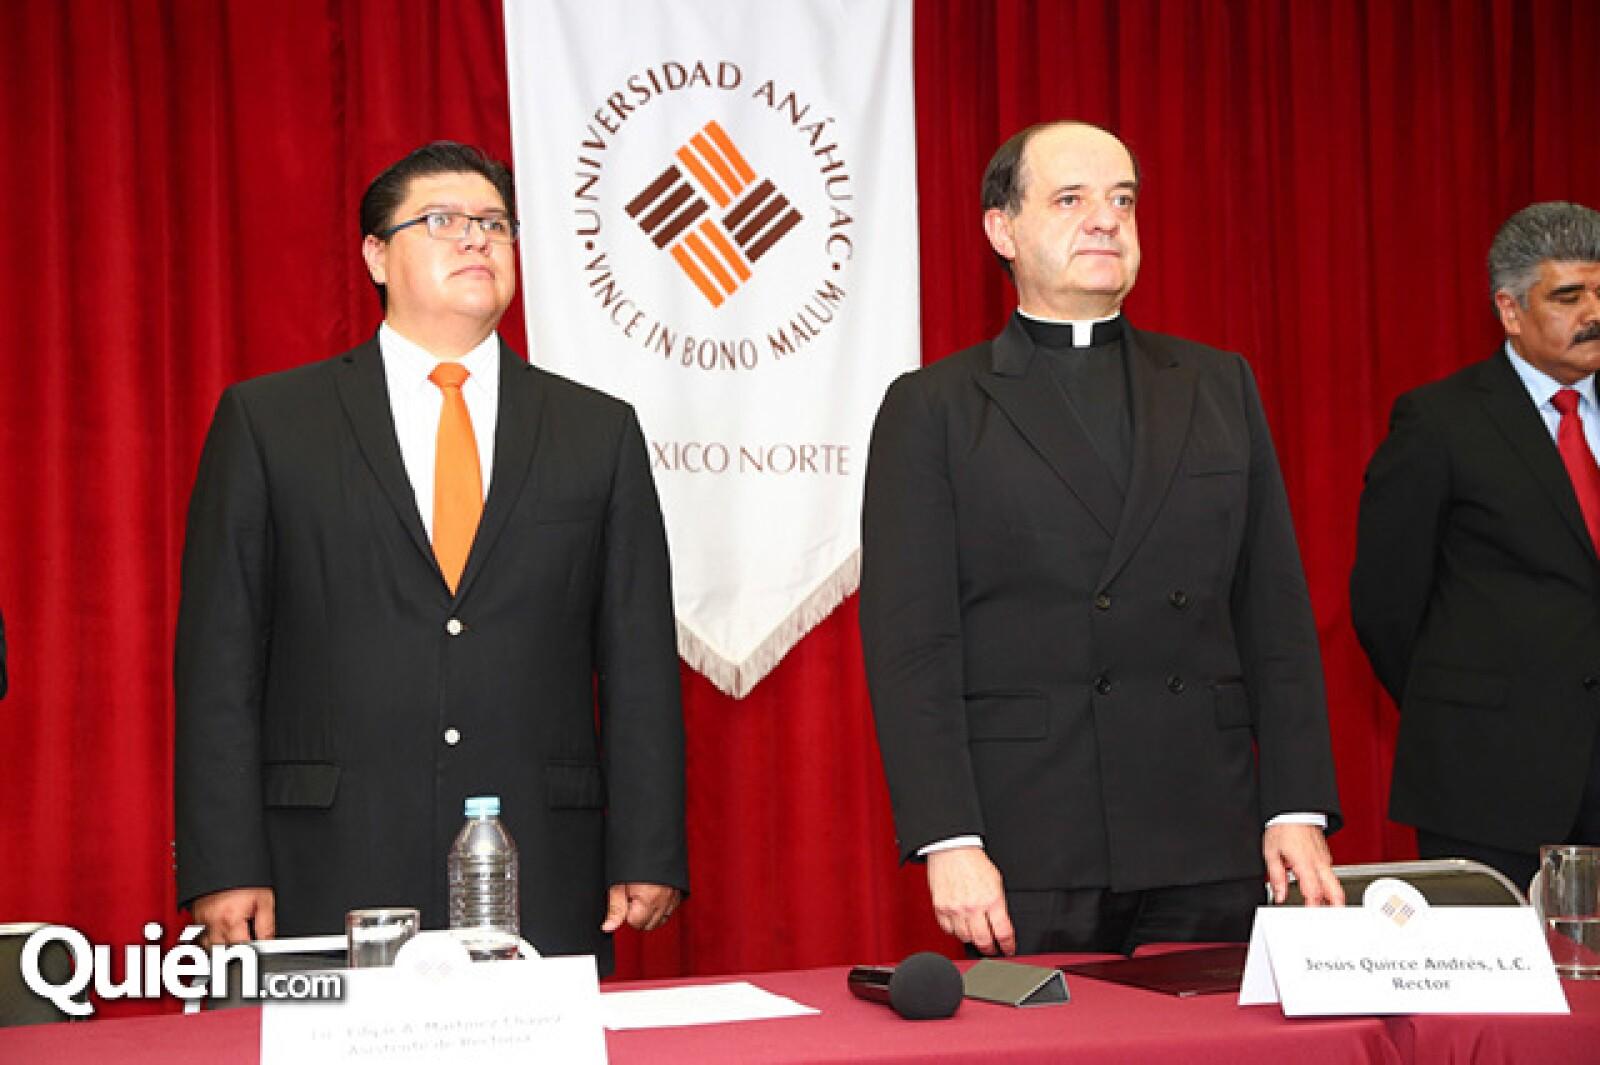 Edgar Martínez Chávez y Padre Jesús Qurice